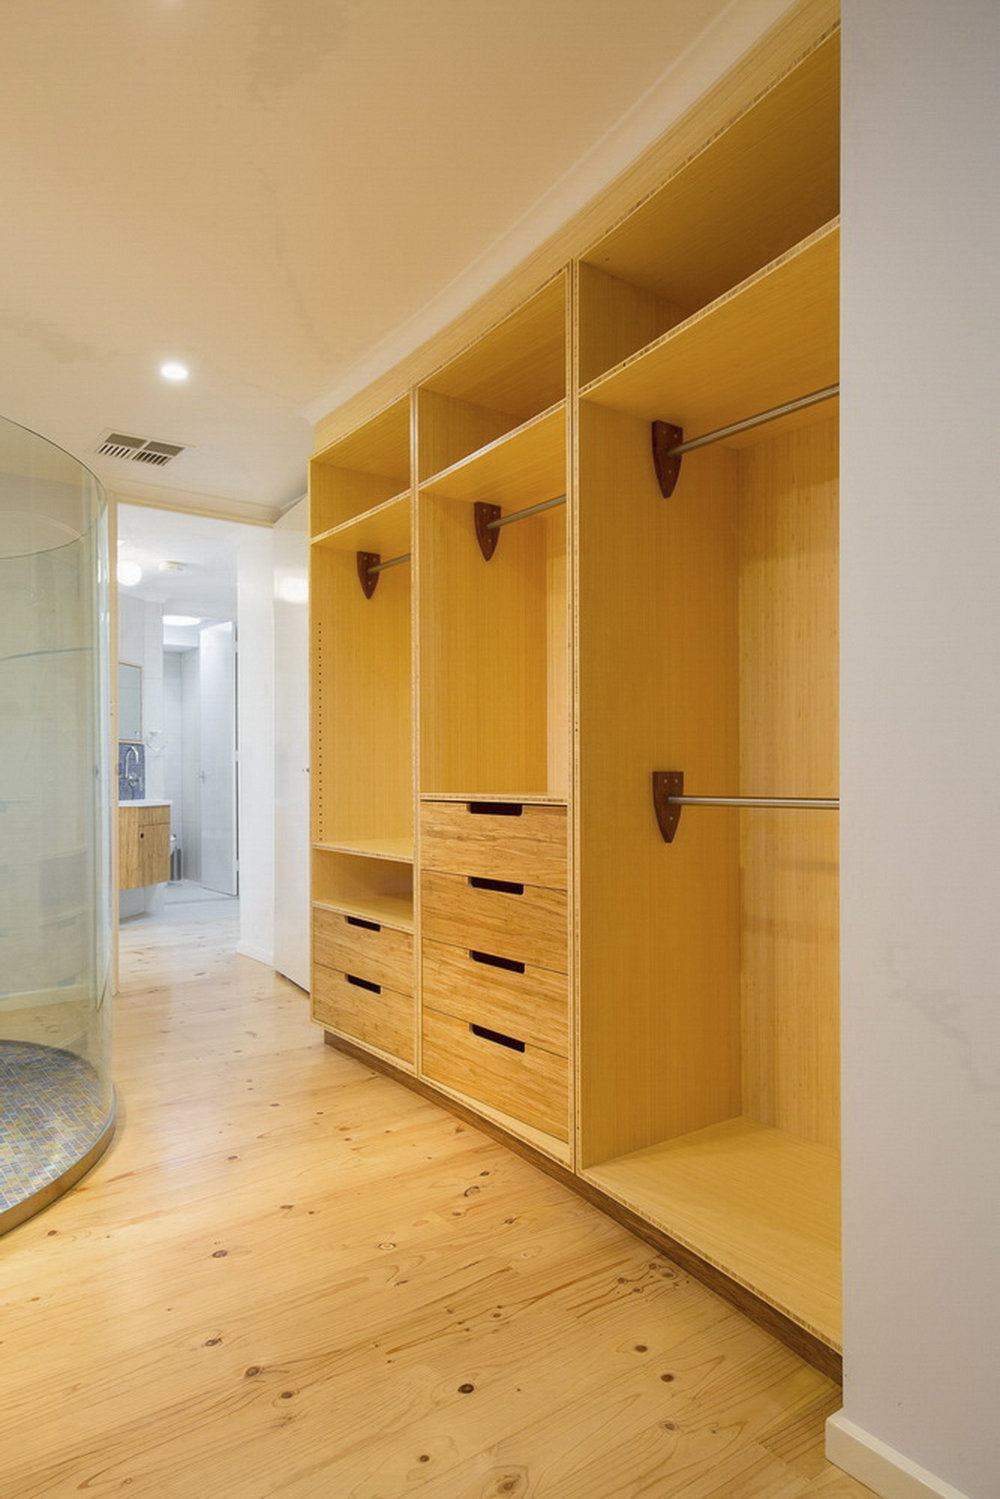 Interiors-43.jpg